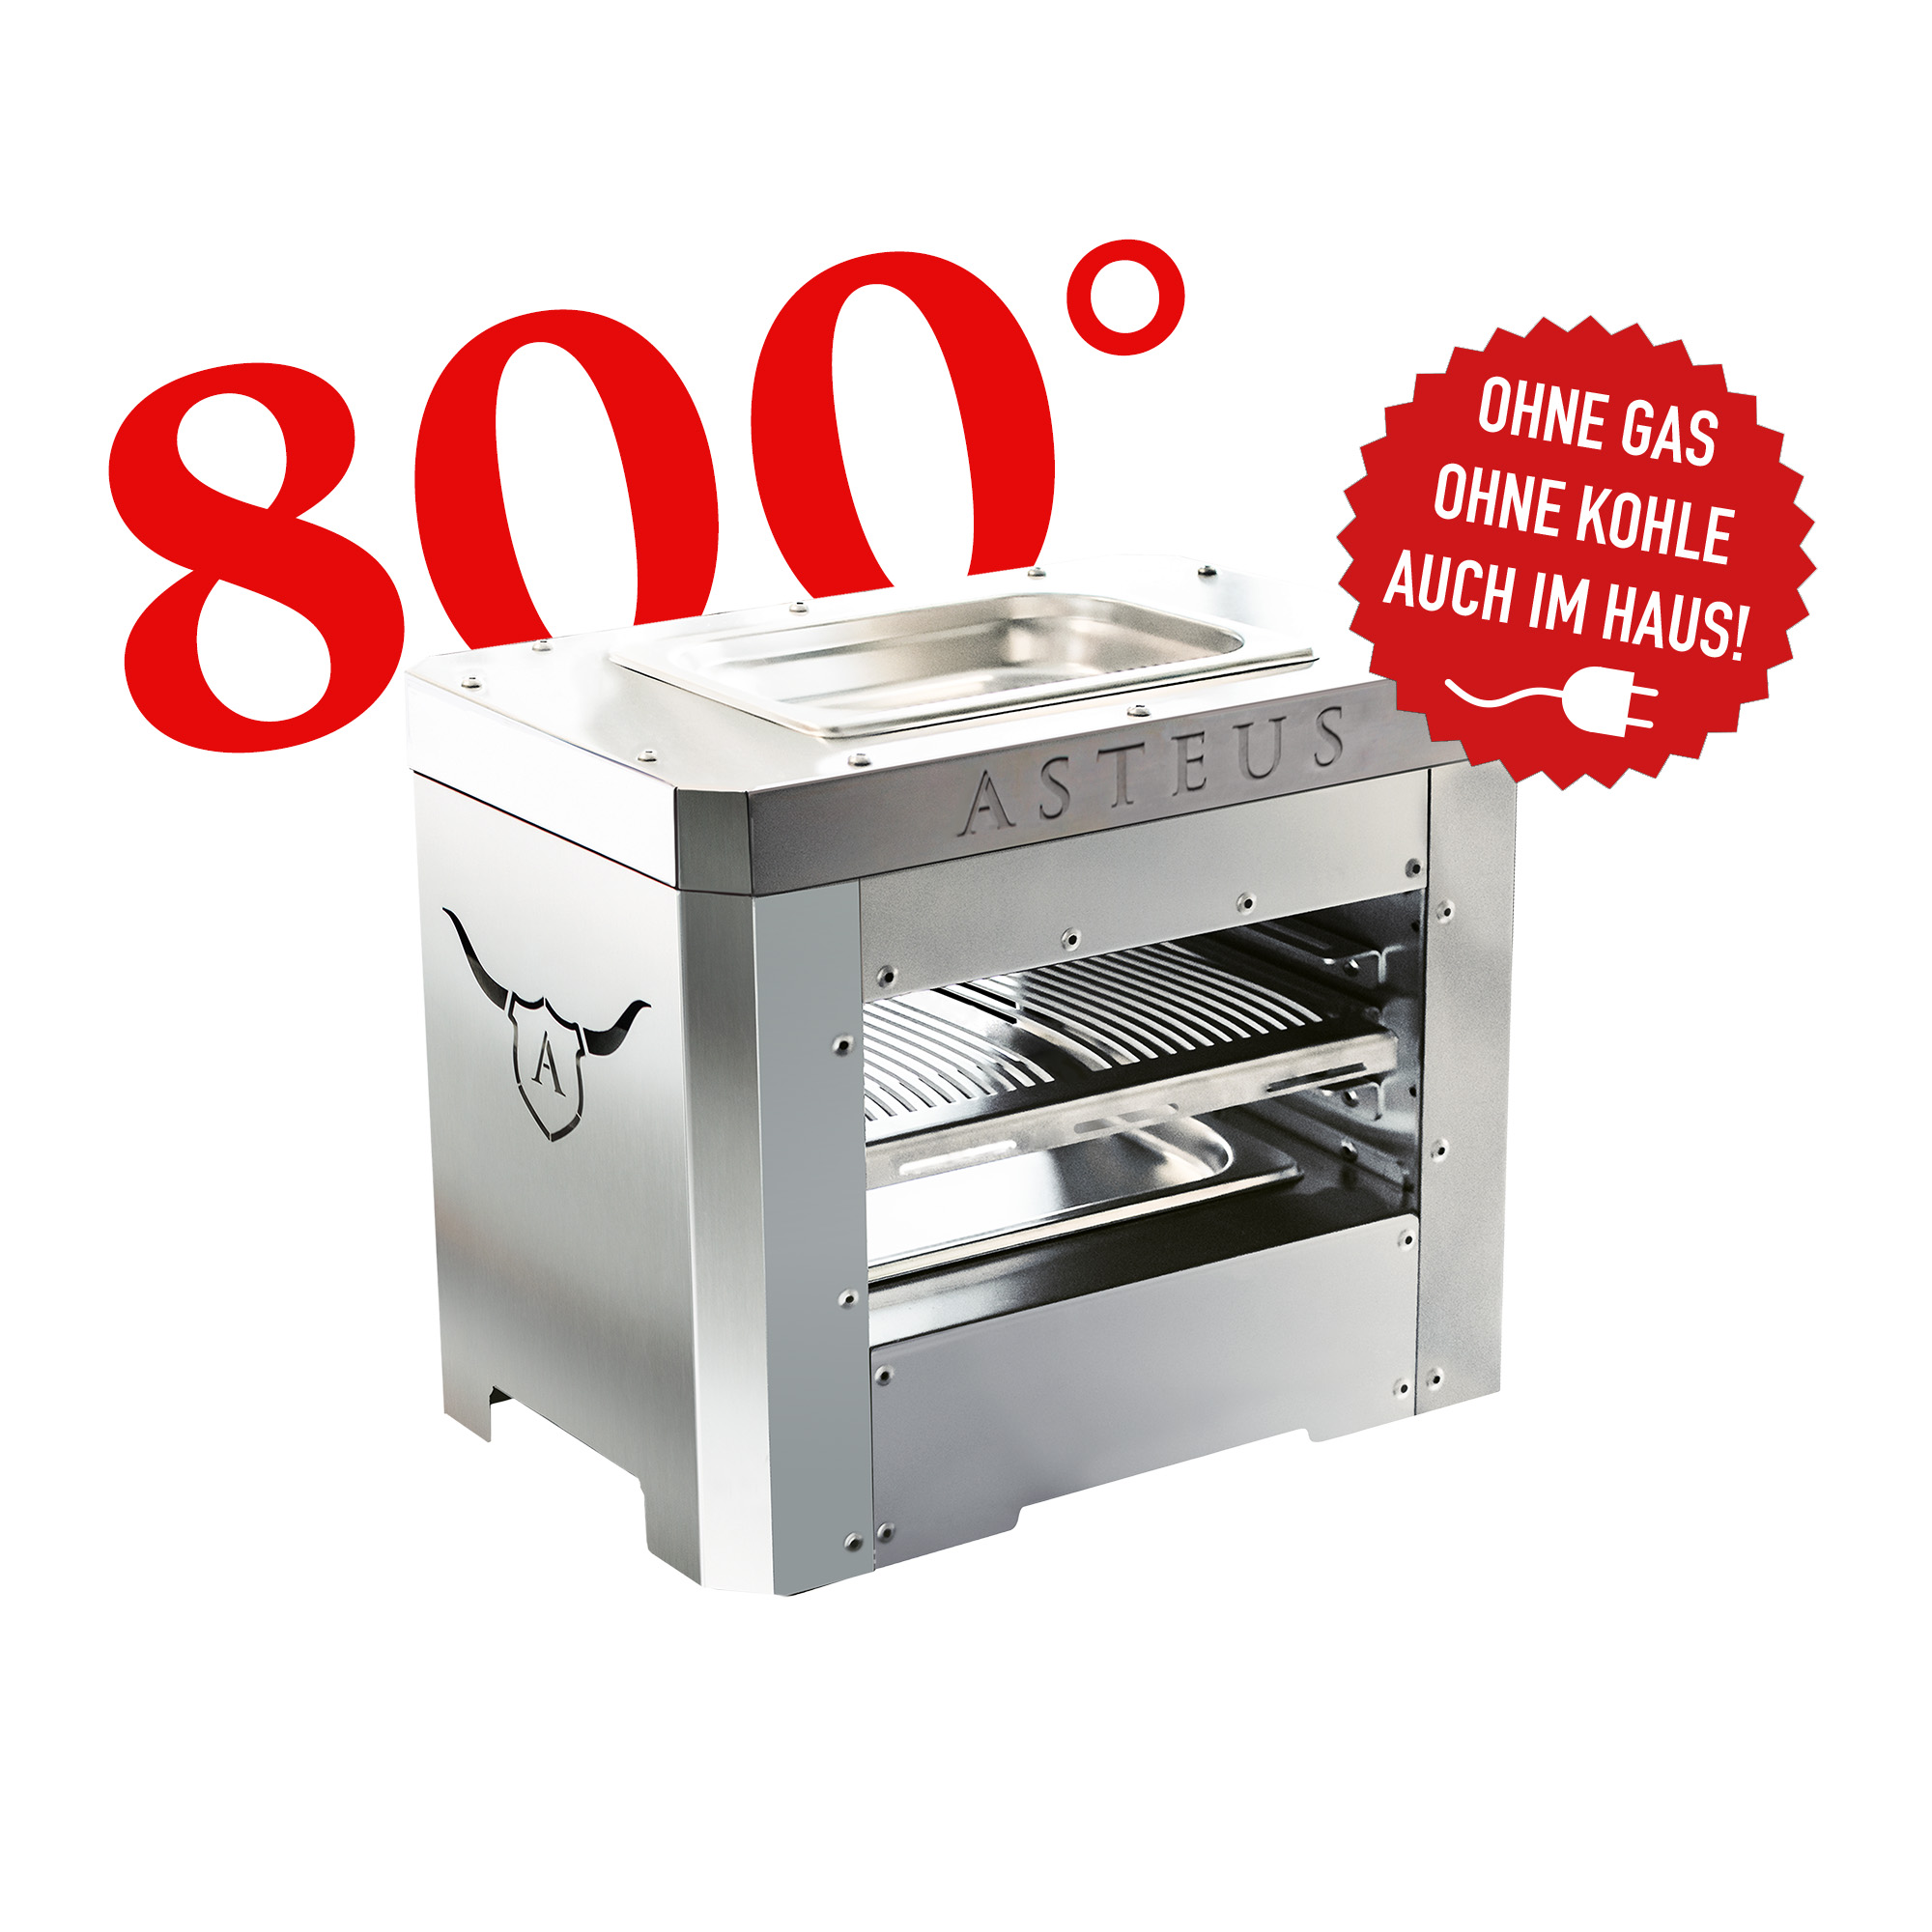 Asteus AST 800 Steaker